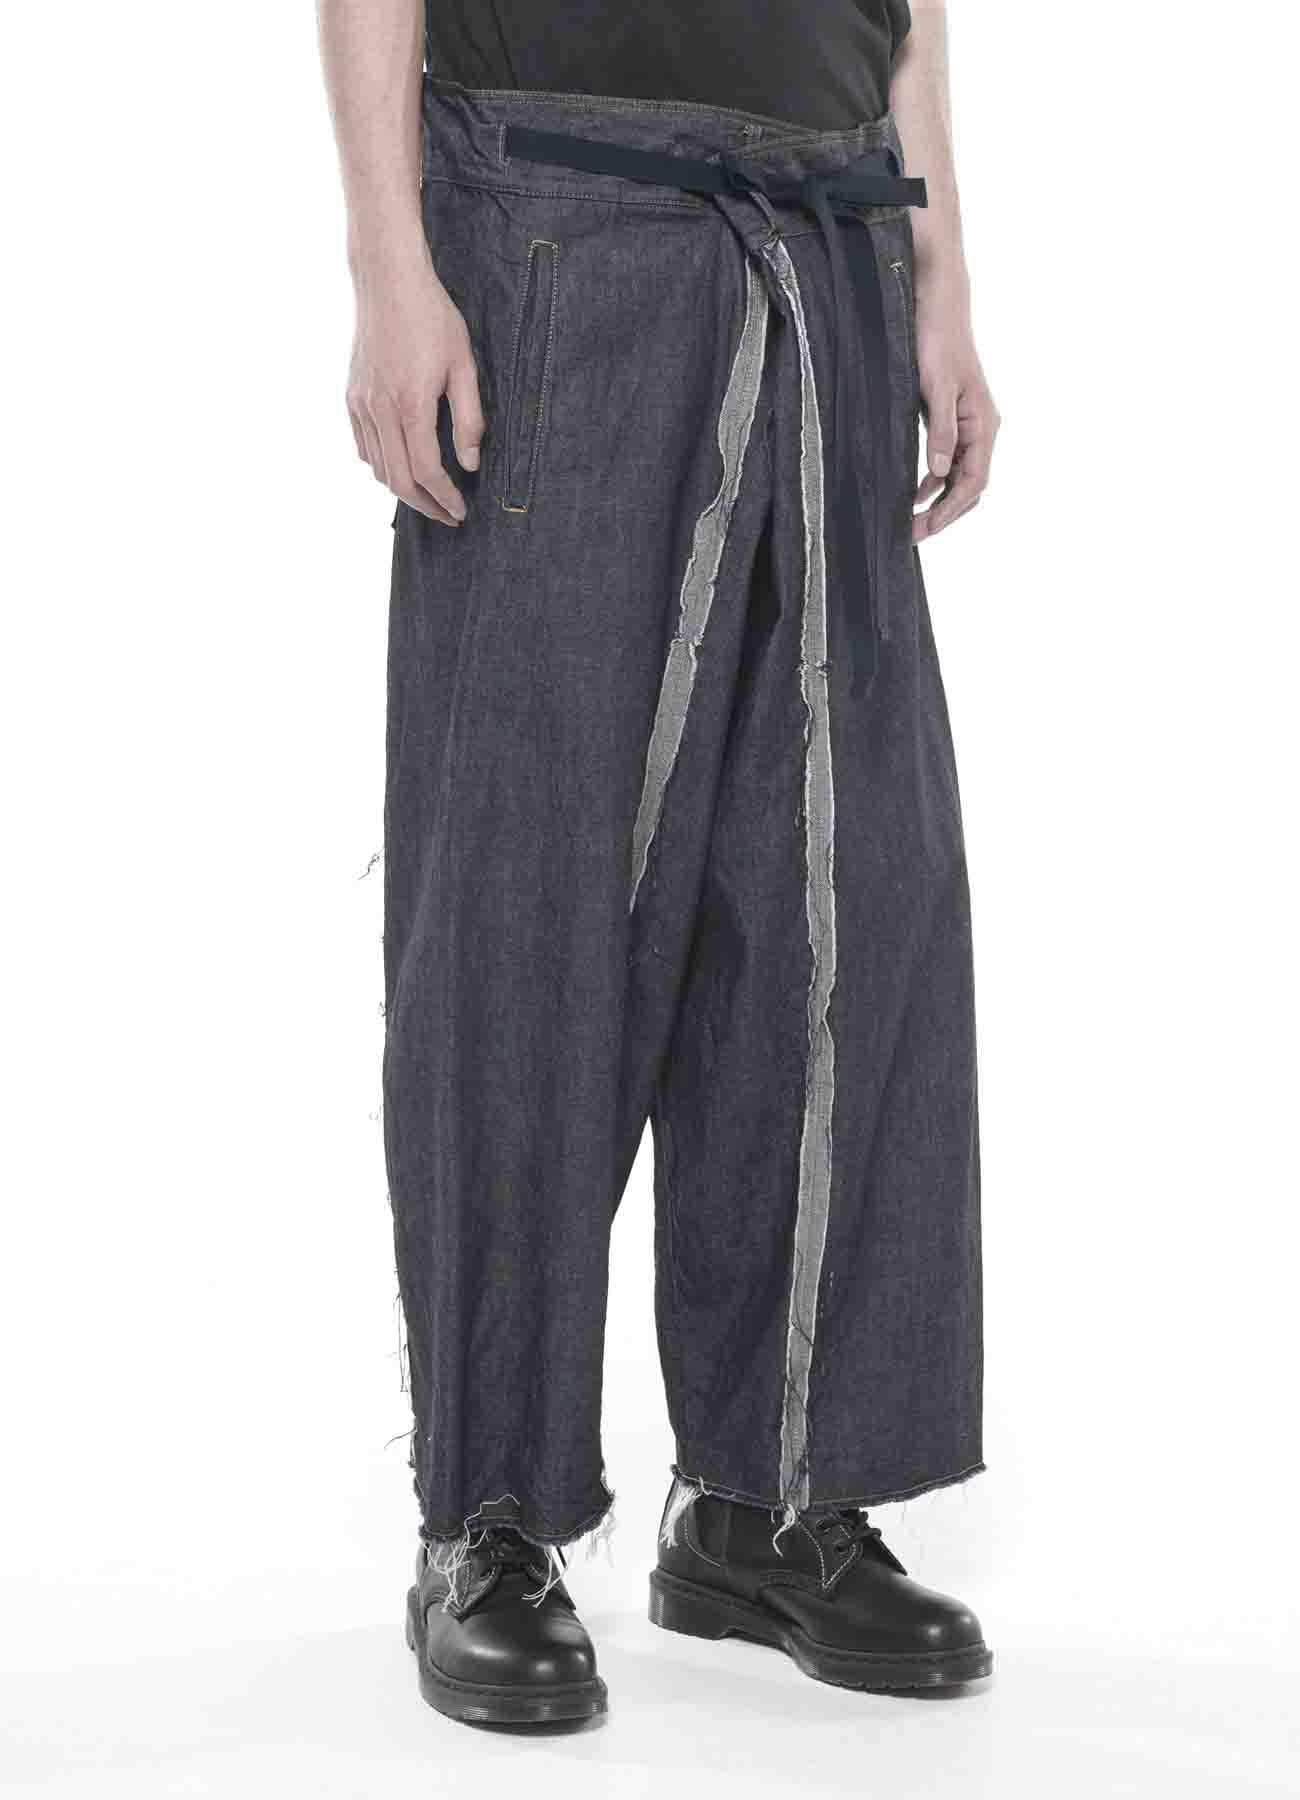 10 oz Denim Waist Fold Wide Pants